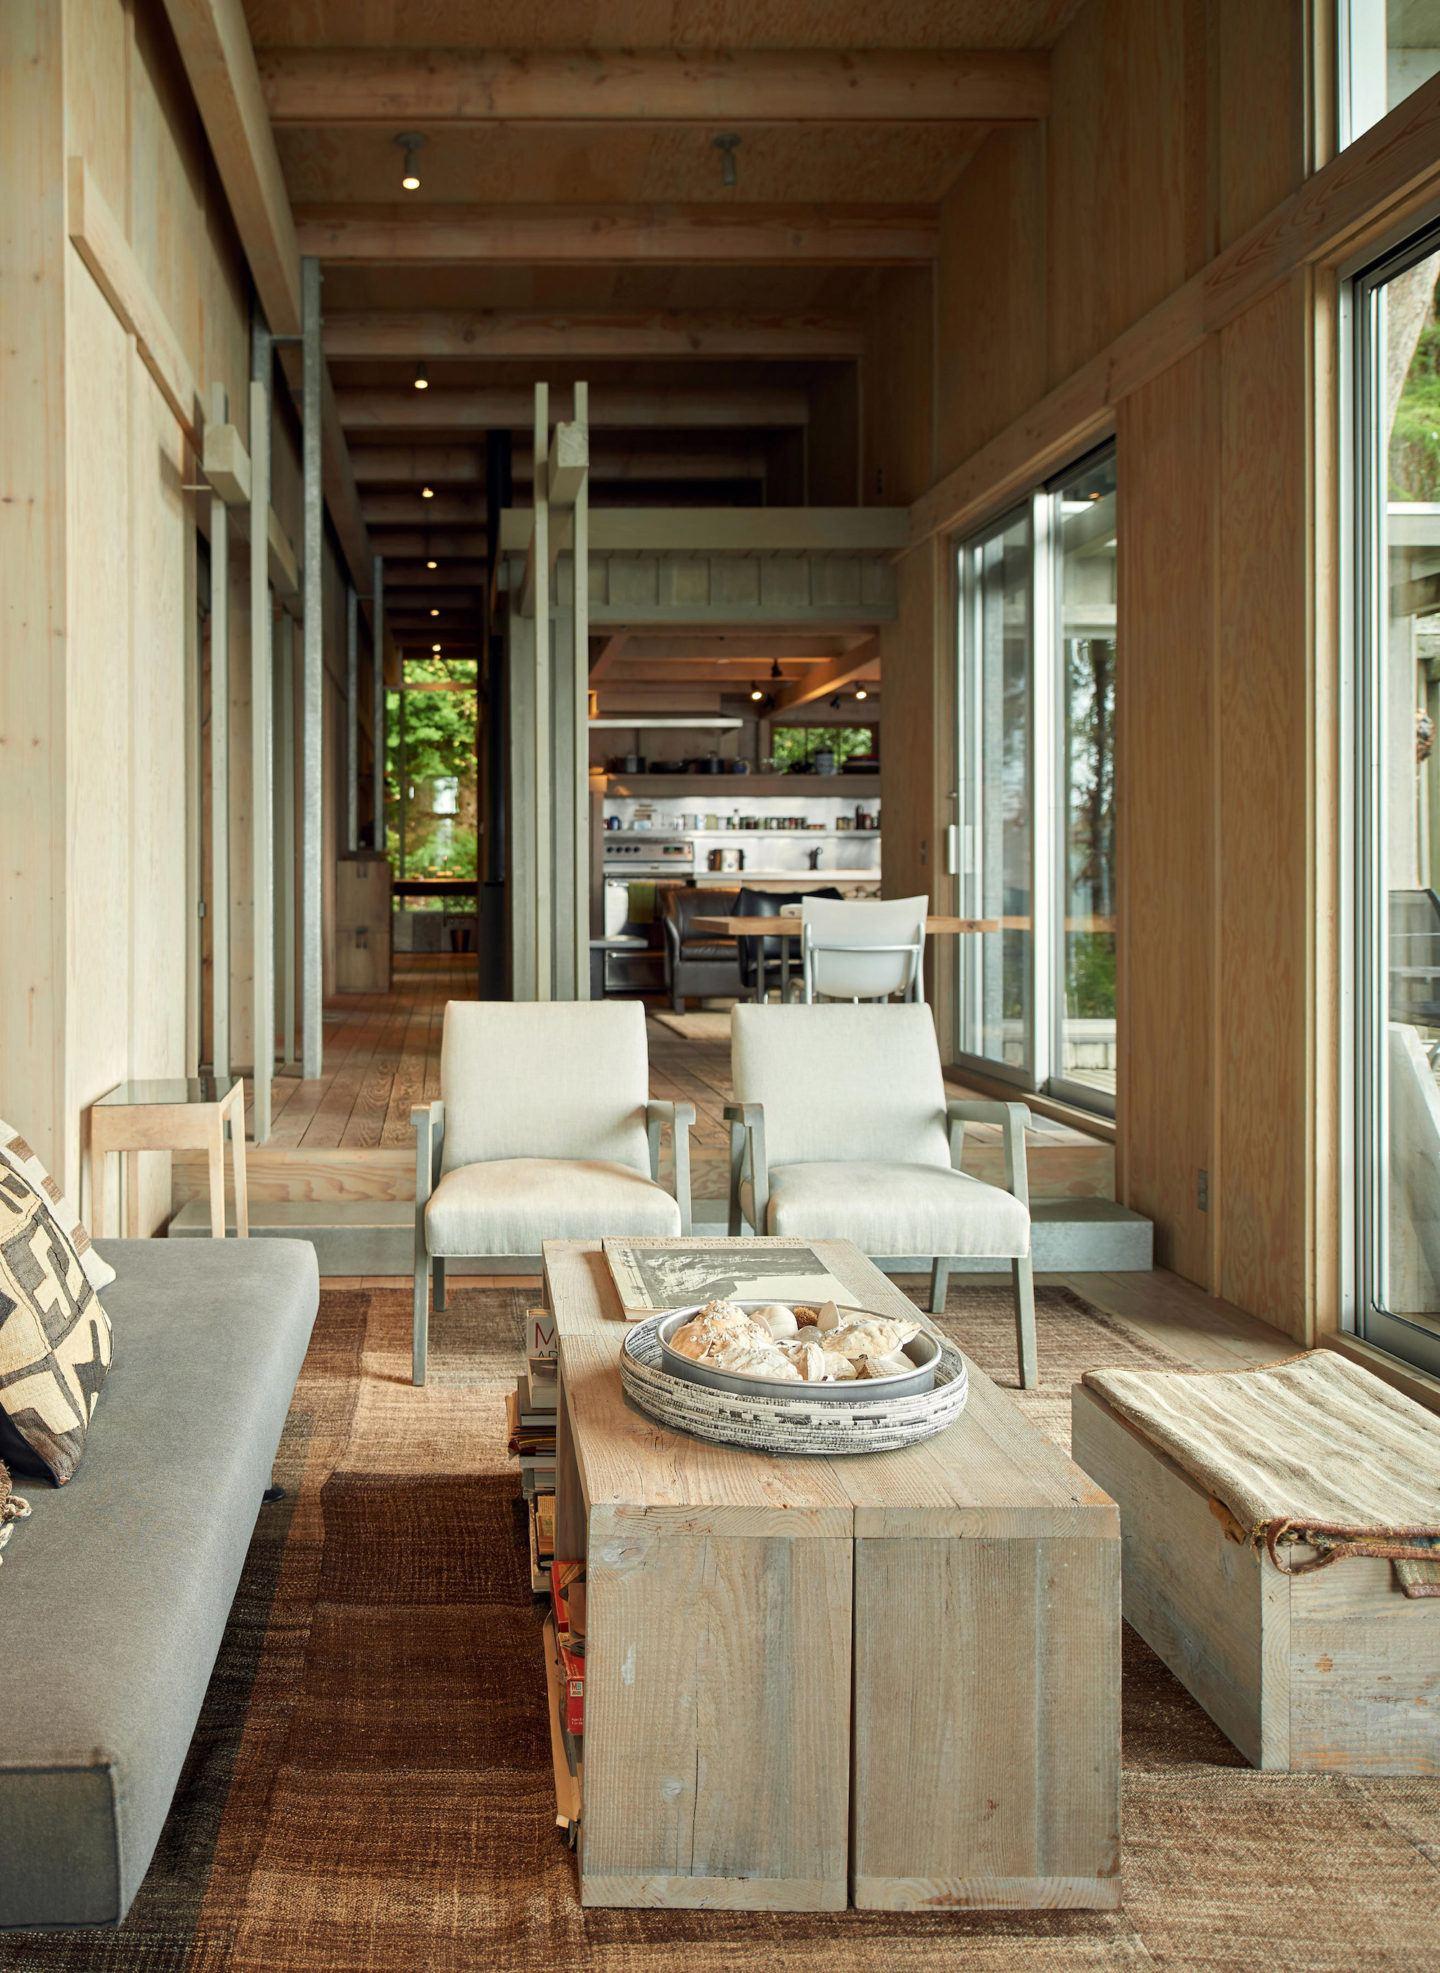 IGNANT-Architecture-Jim-Olson-Cabin-Longbranch-008